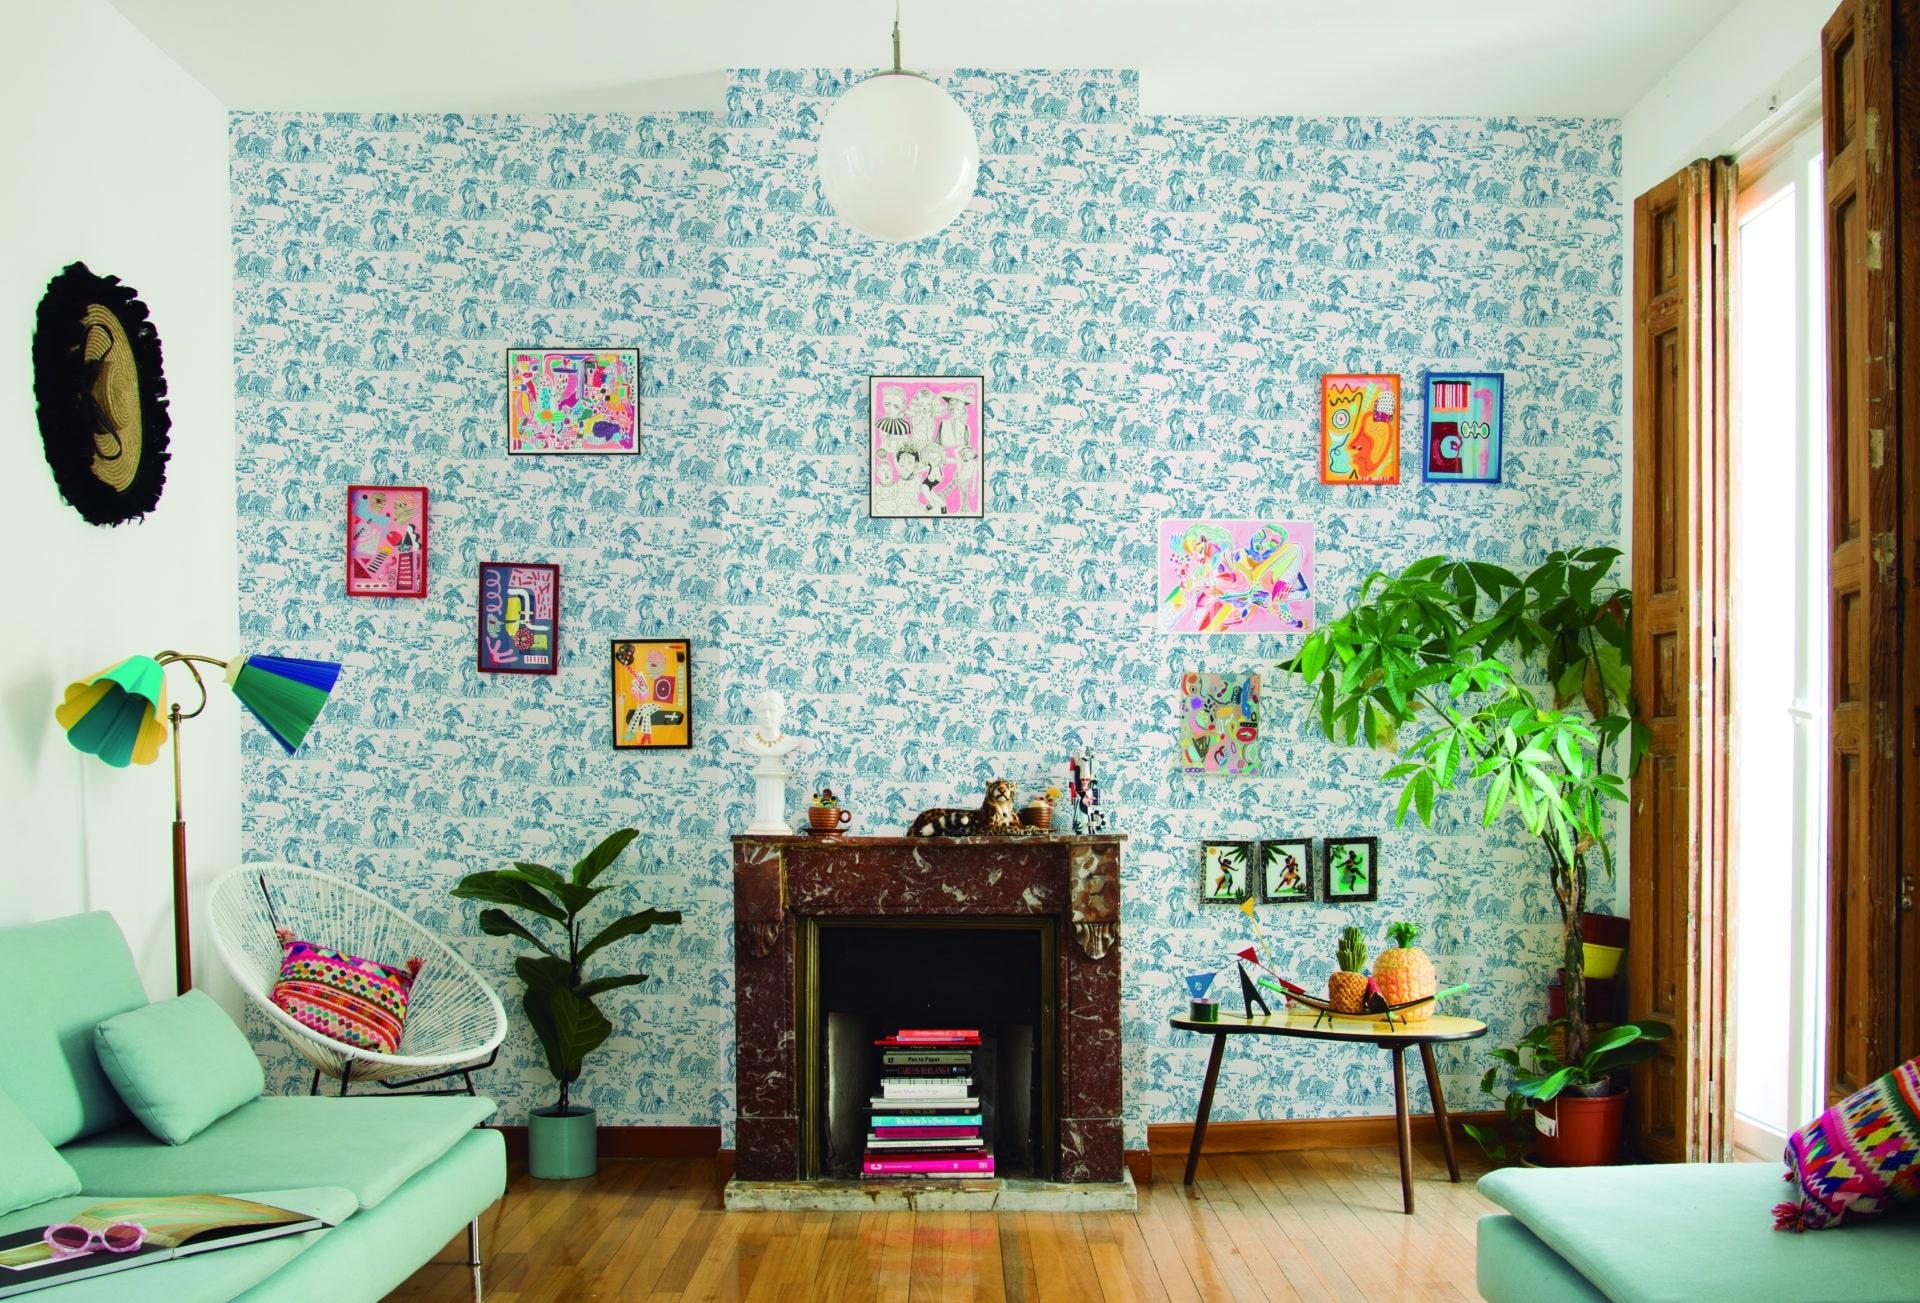 papel_pintado_hogar_instalacion_003